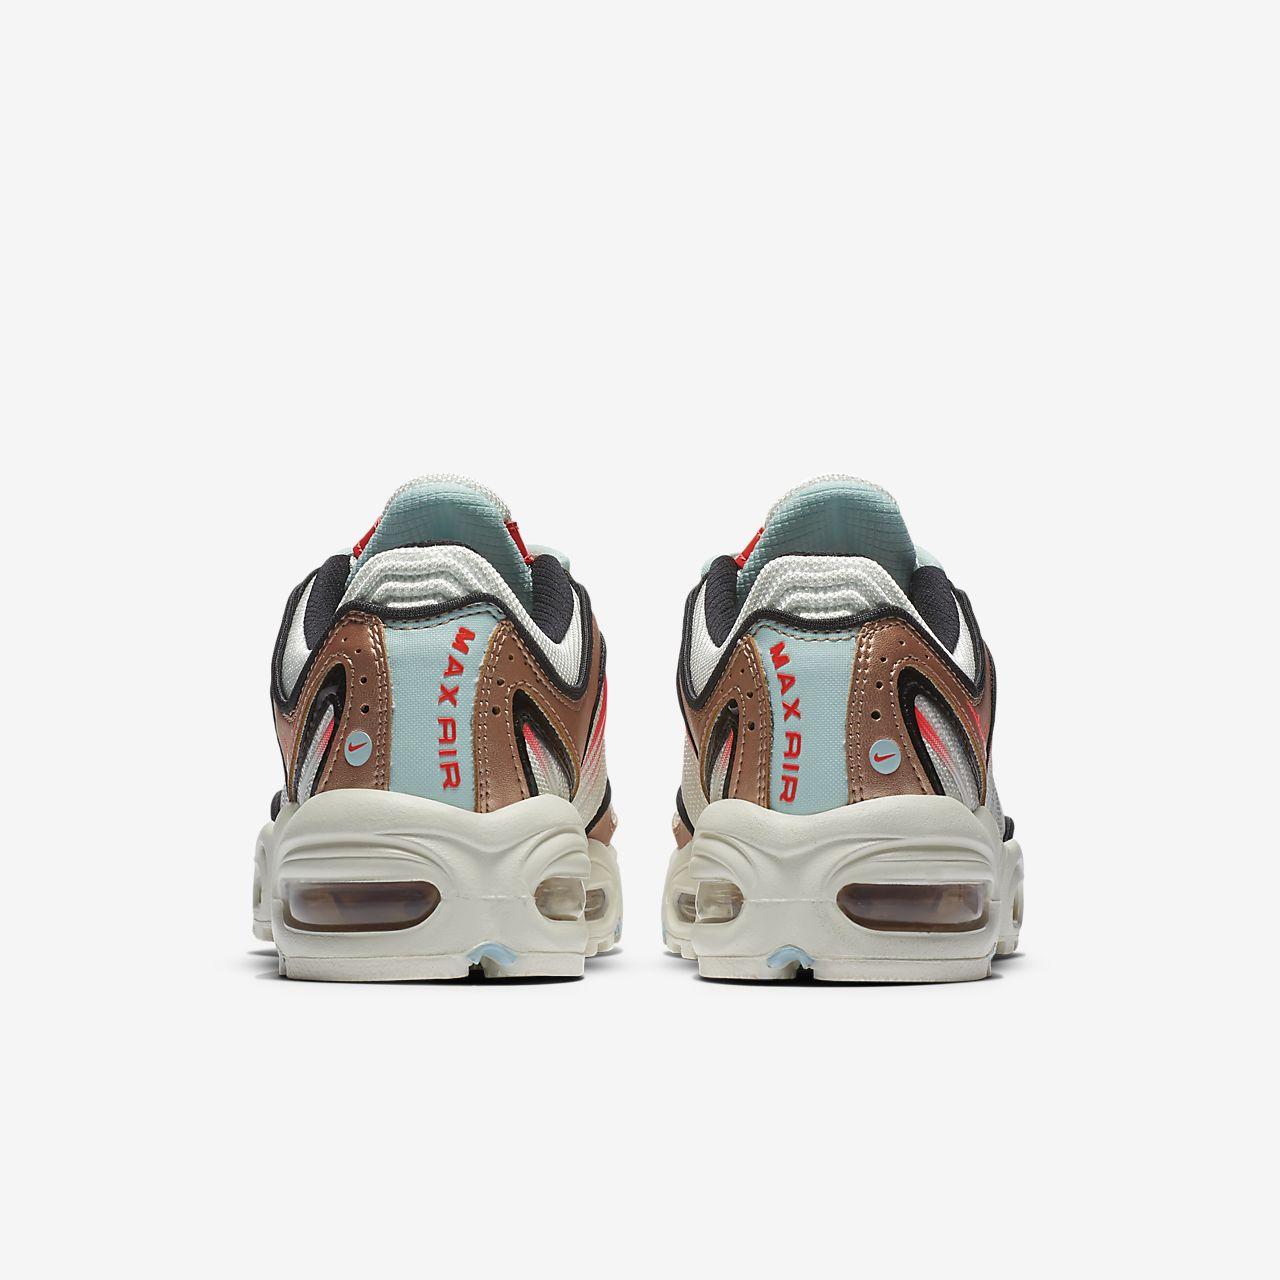 Sapatilhas Nike Air Max Tailwind IV para mulher